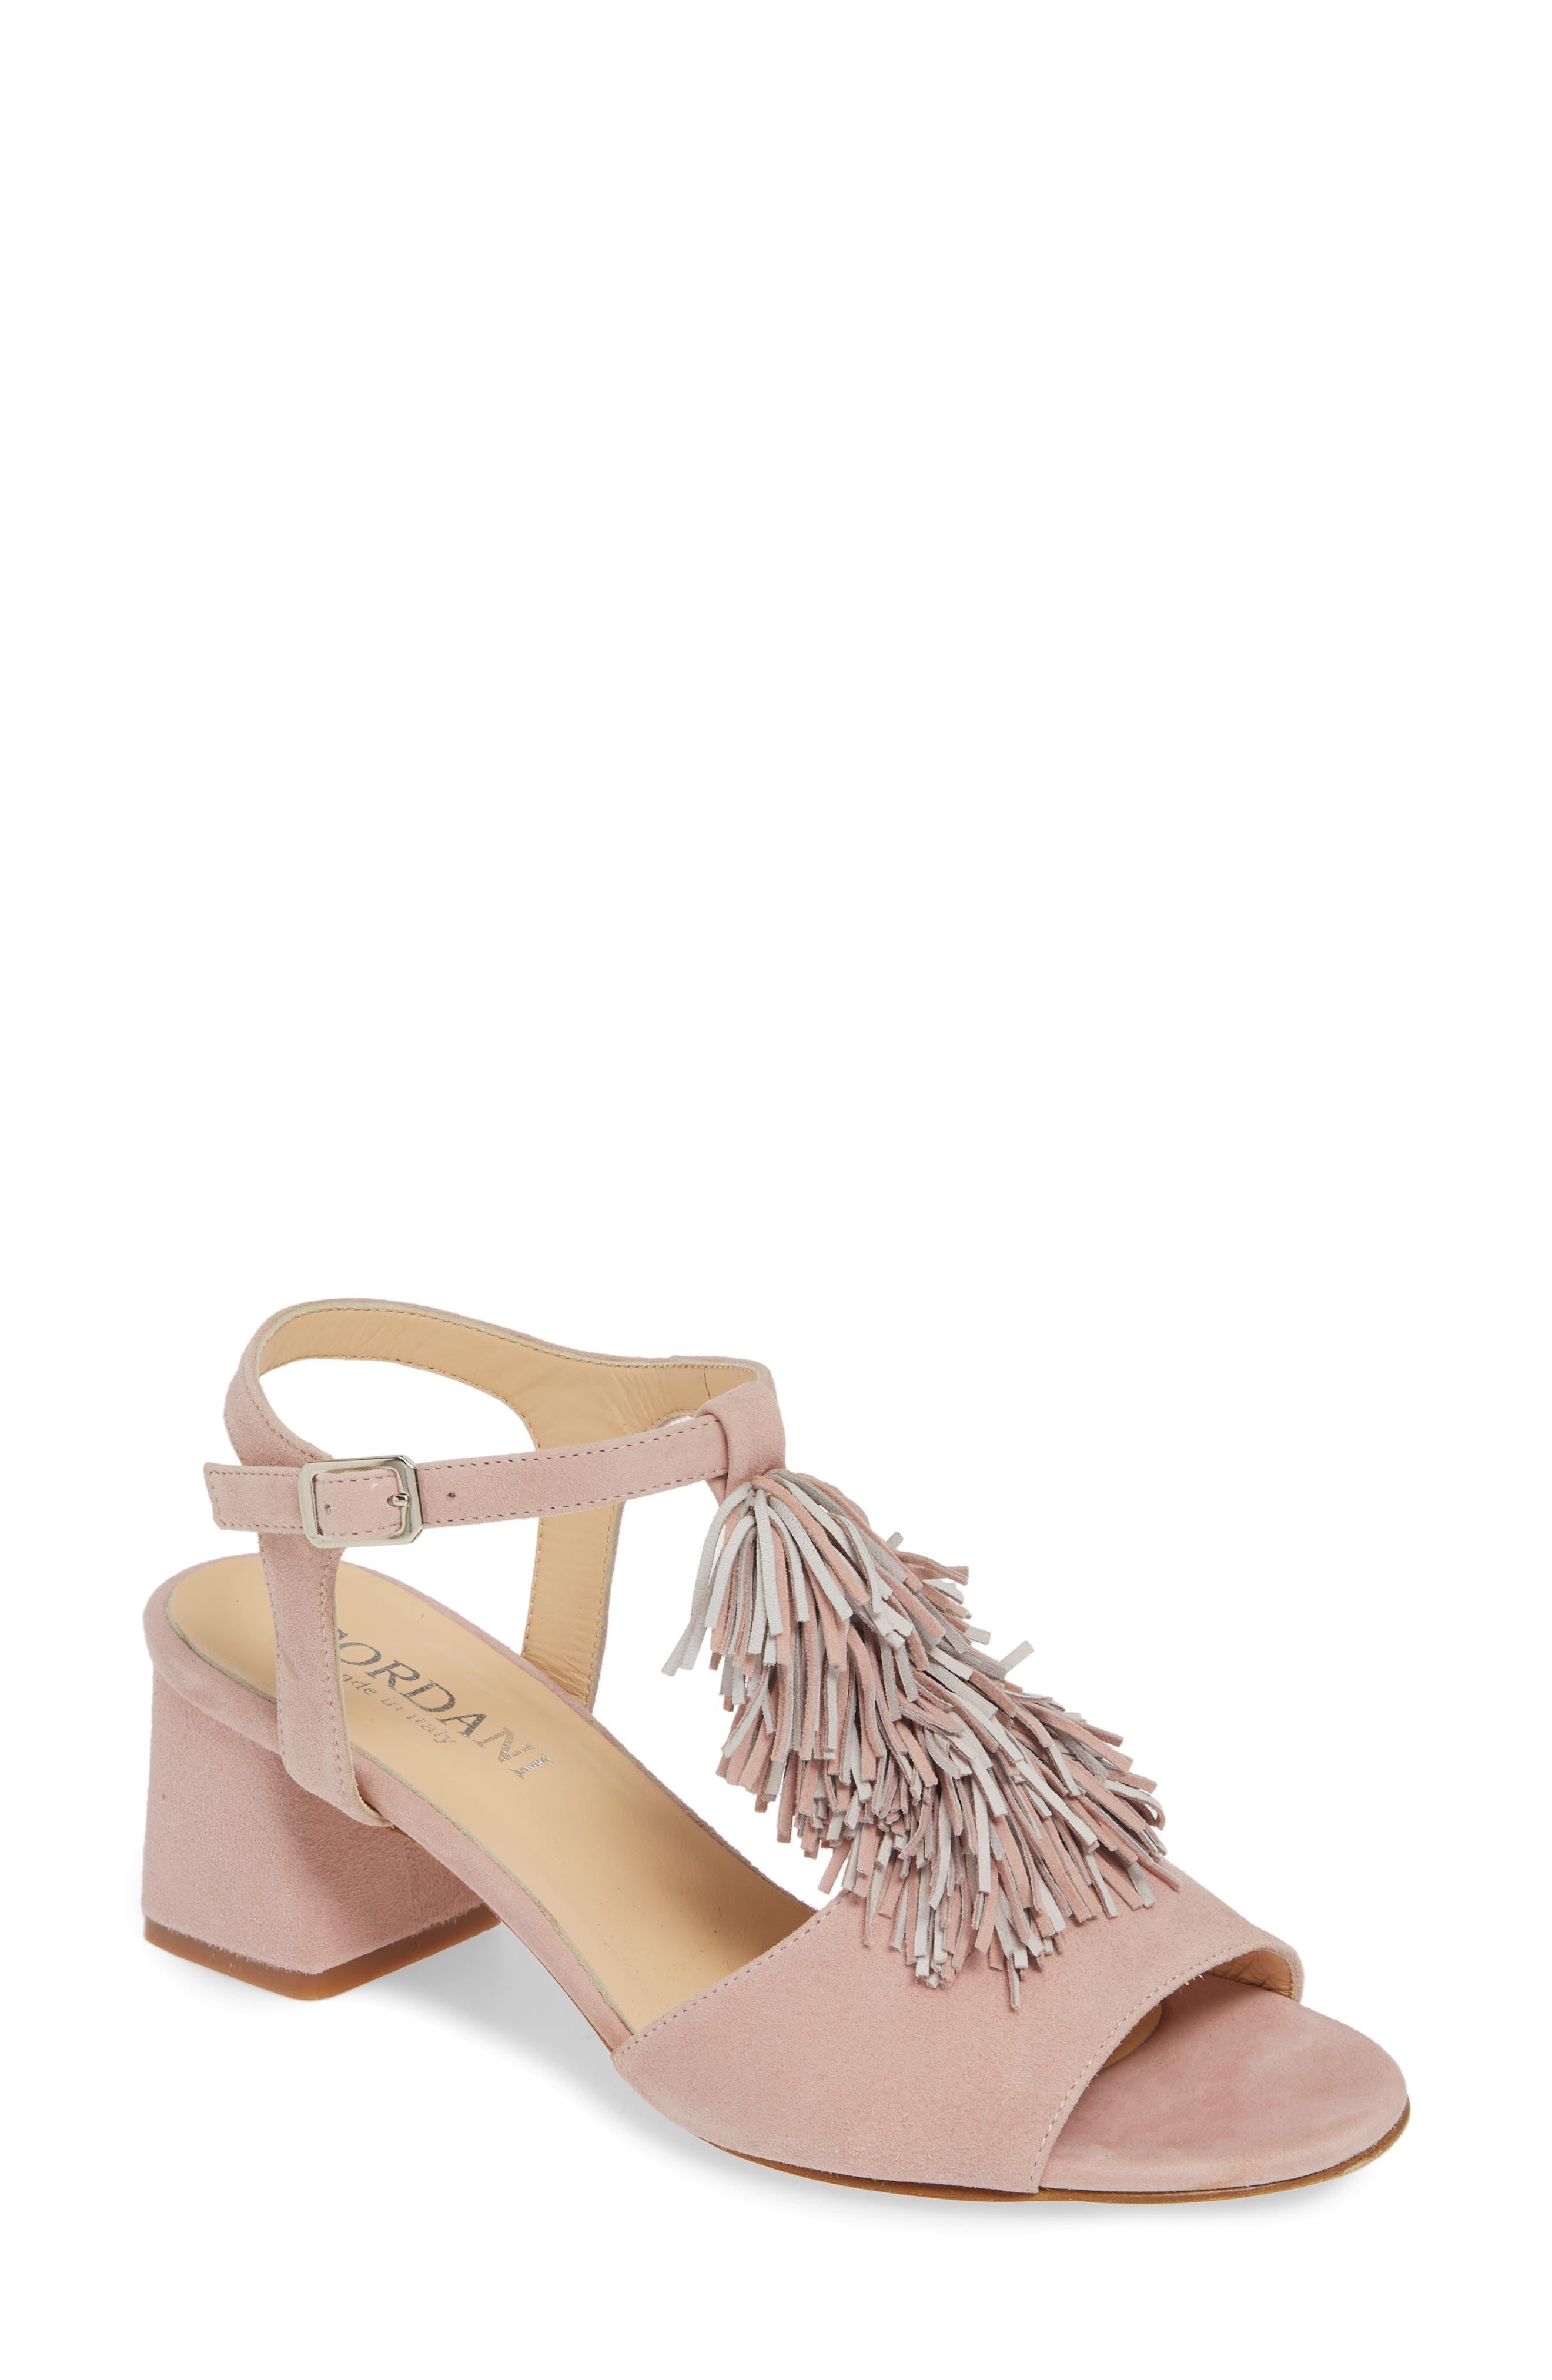 Cordani Nash Tassel Sandal - Beige